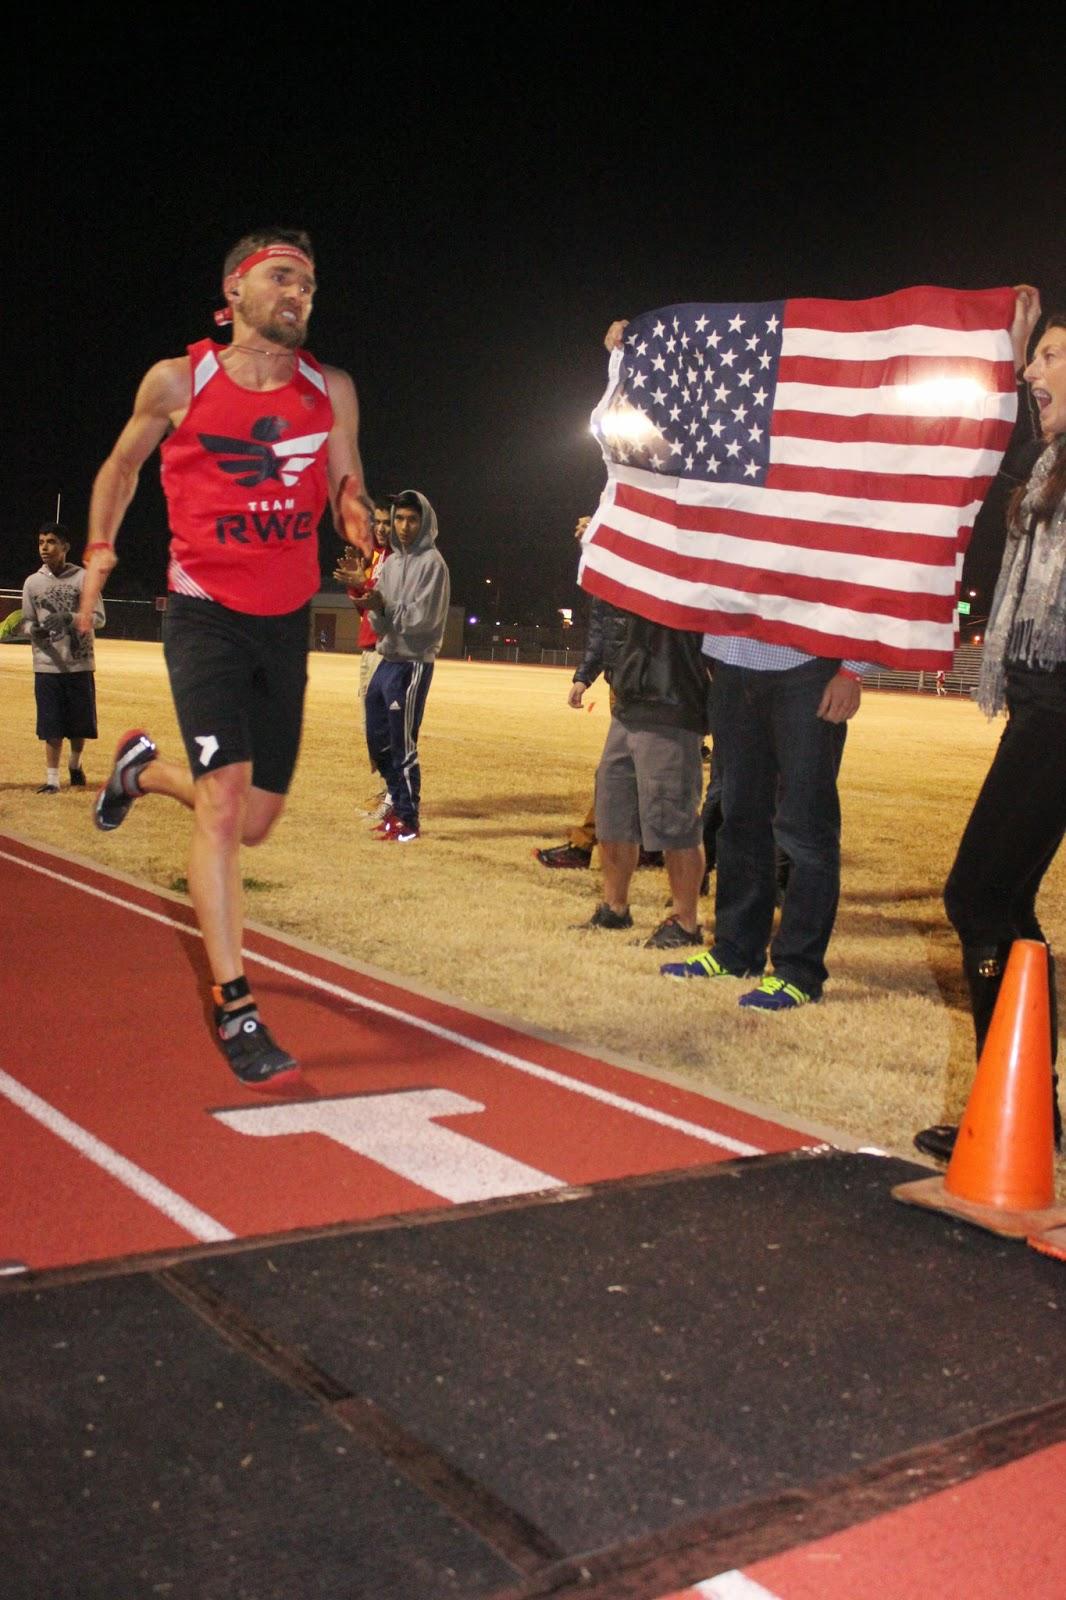 Paleo Runner: Zach Bitter - High Performance, Low-Carb Running